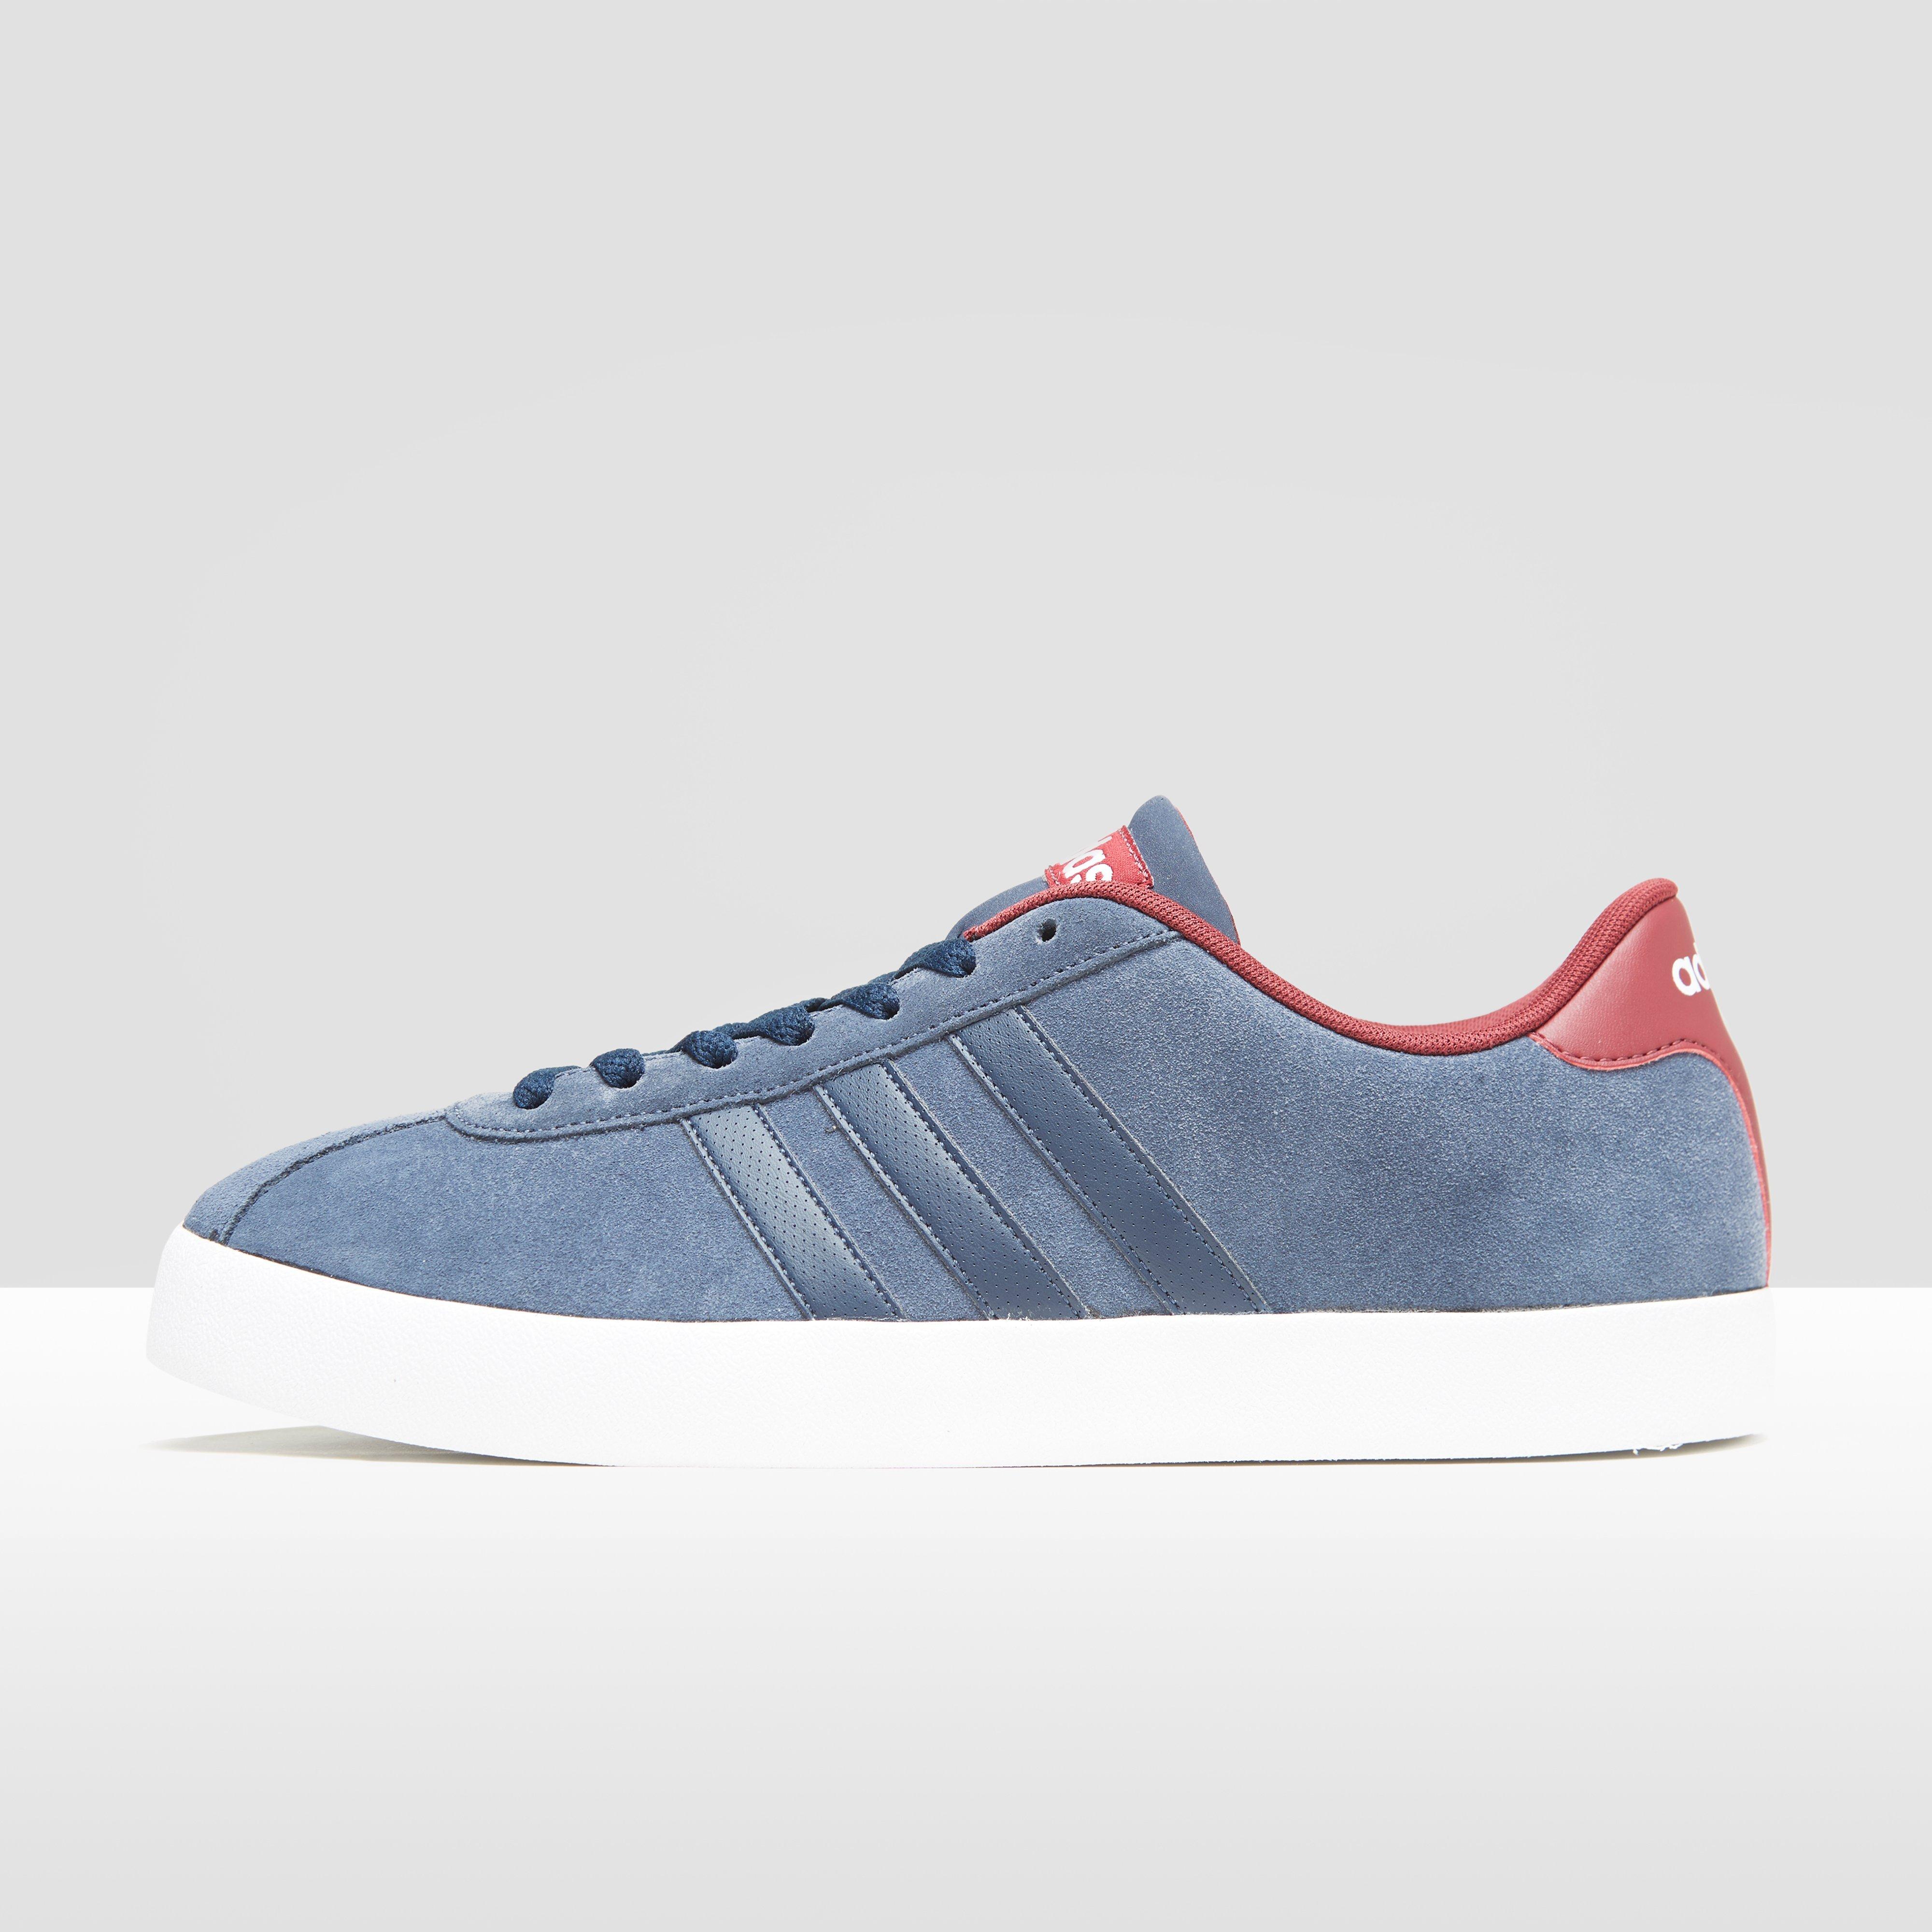 Adidas - Court Vulc Sneakers - Hommes - Baskets - Blanc - 43 1/3 fokvG9